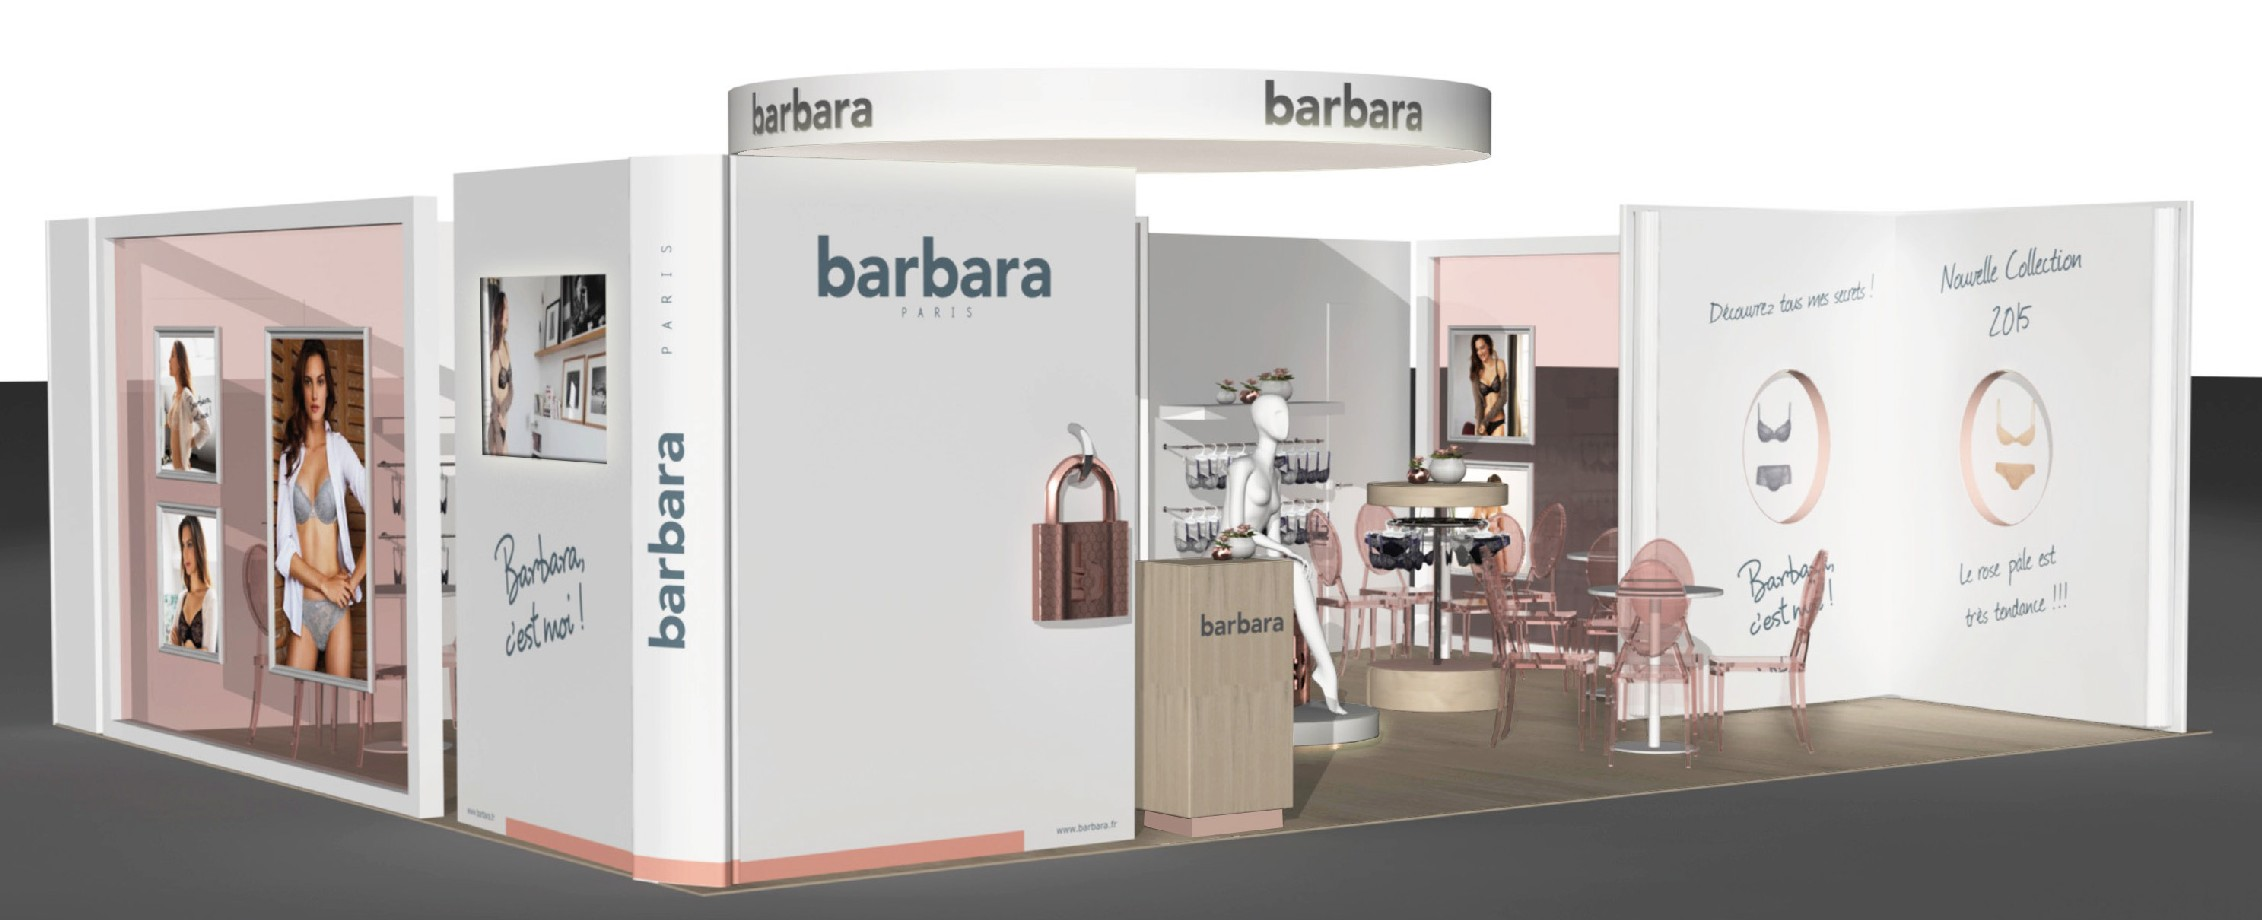 book barbara 2014-02